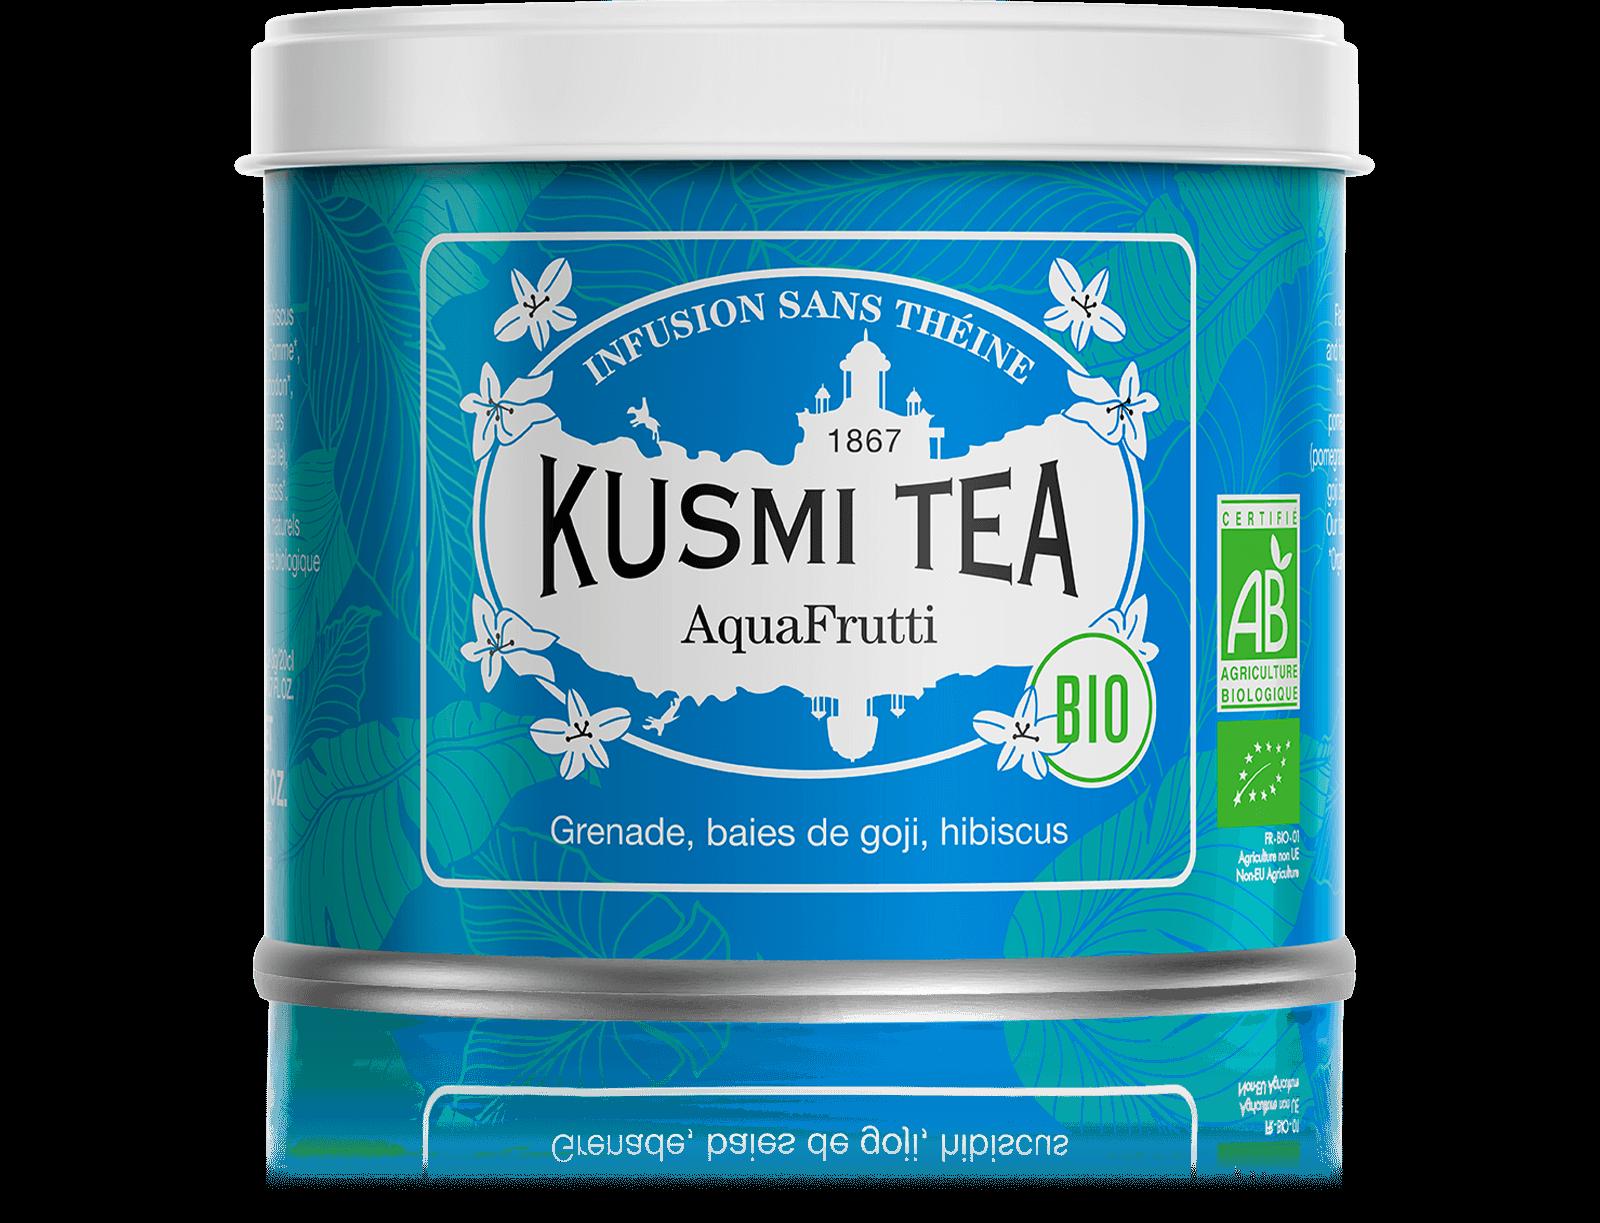 AquaFrutti Infusion de fruits bio - Infusion hibiscus, baies de goji - Boîte de thé en vrac - Kusmi Tea